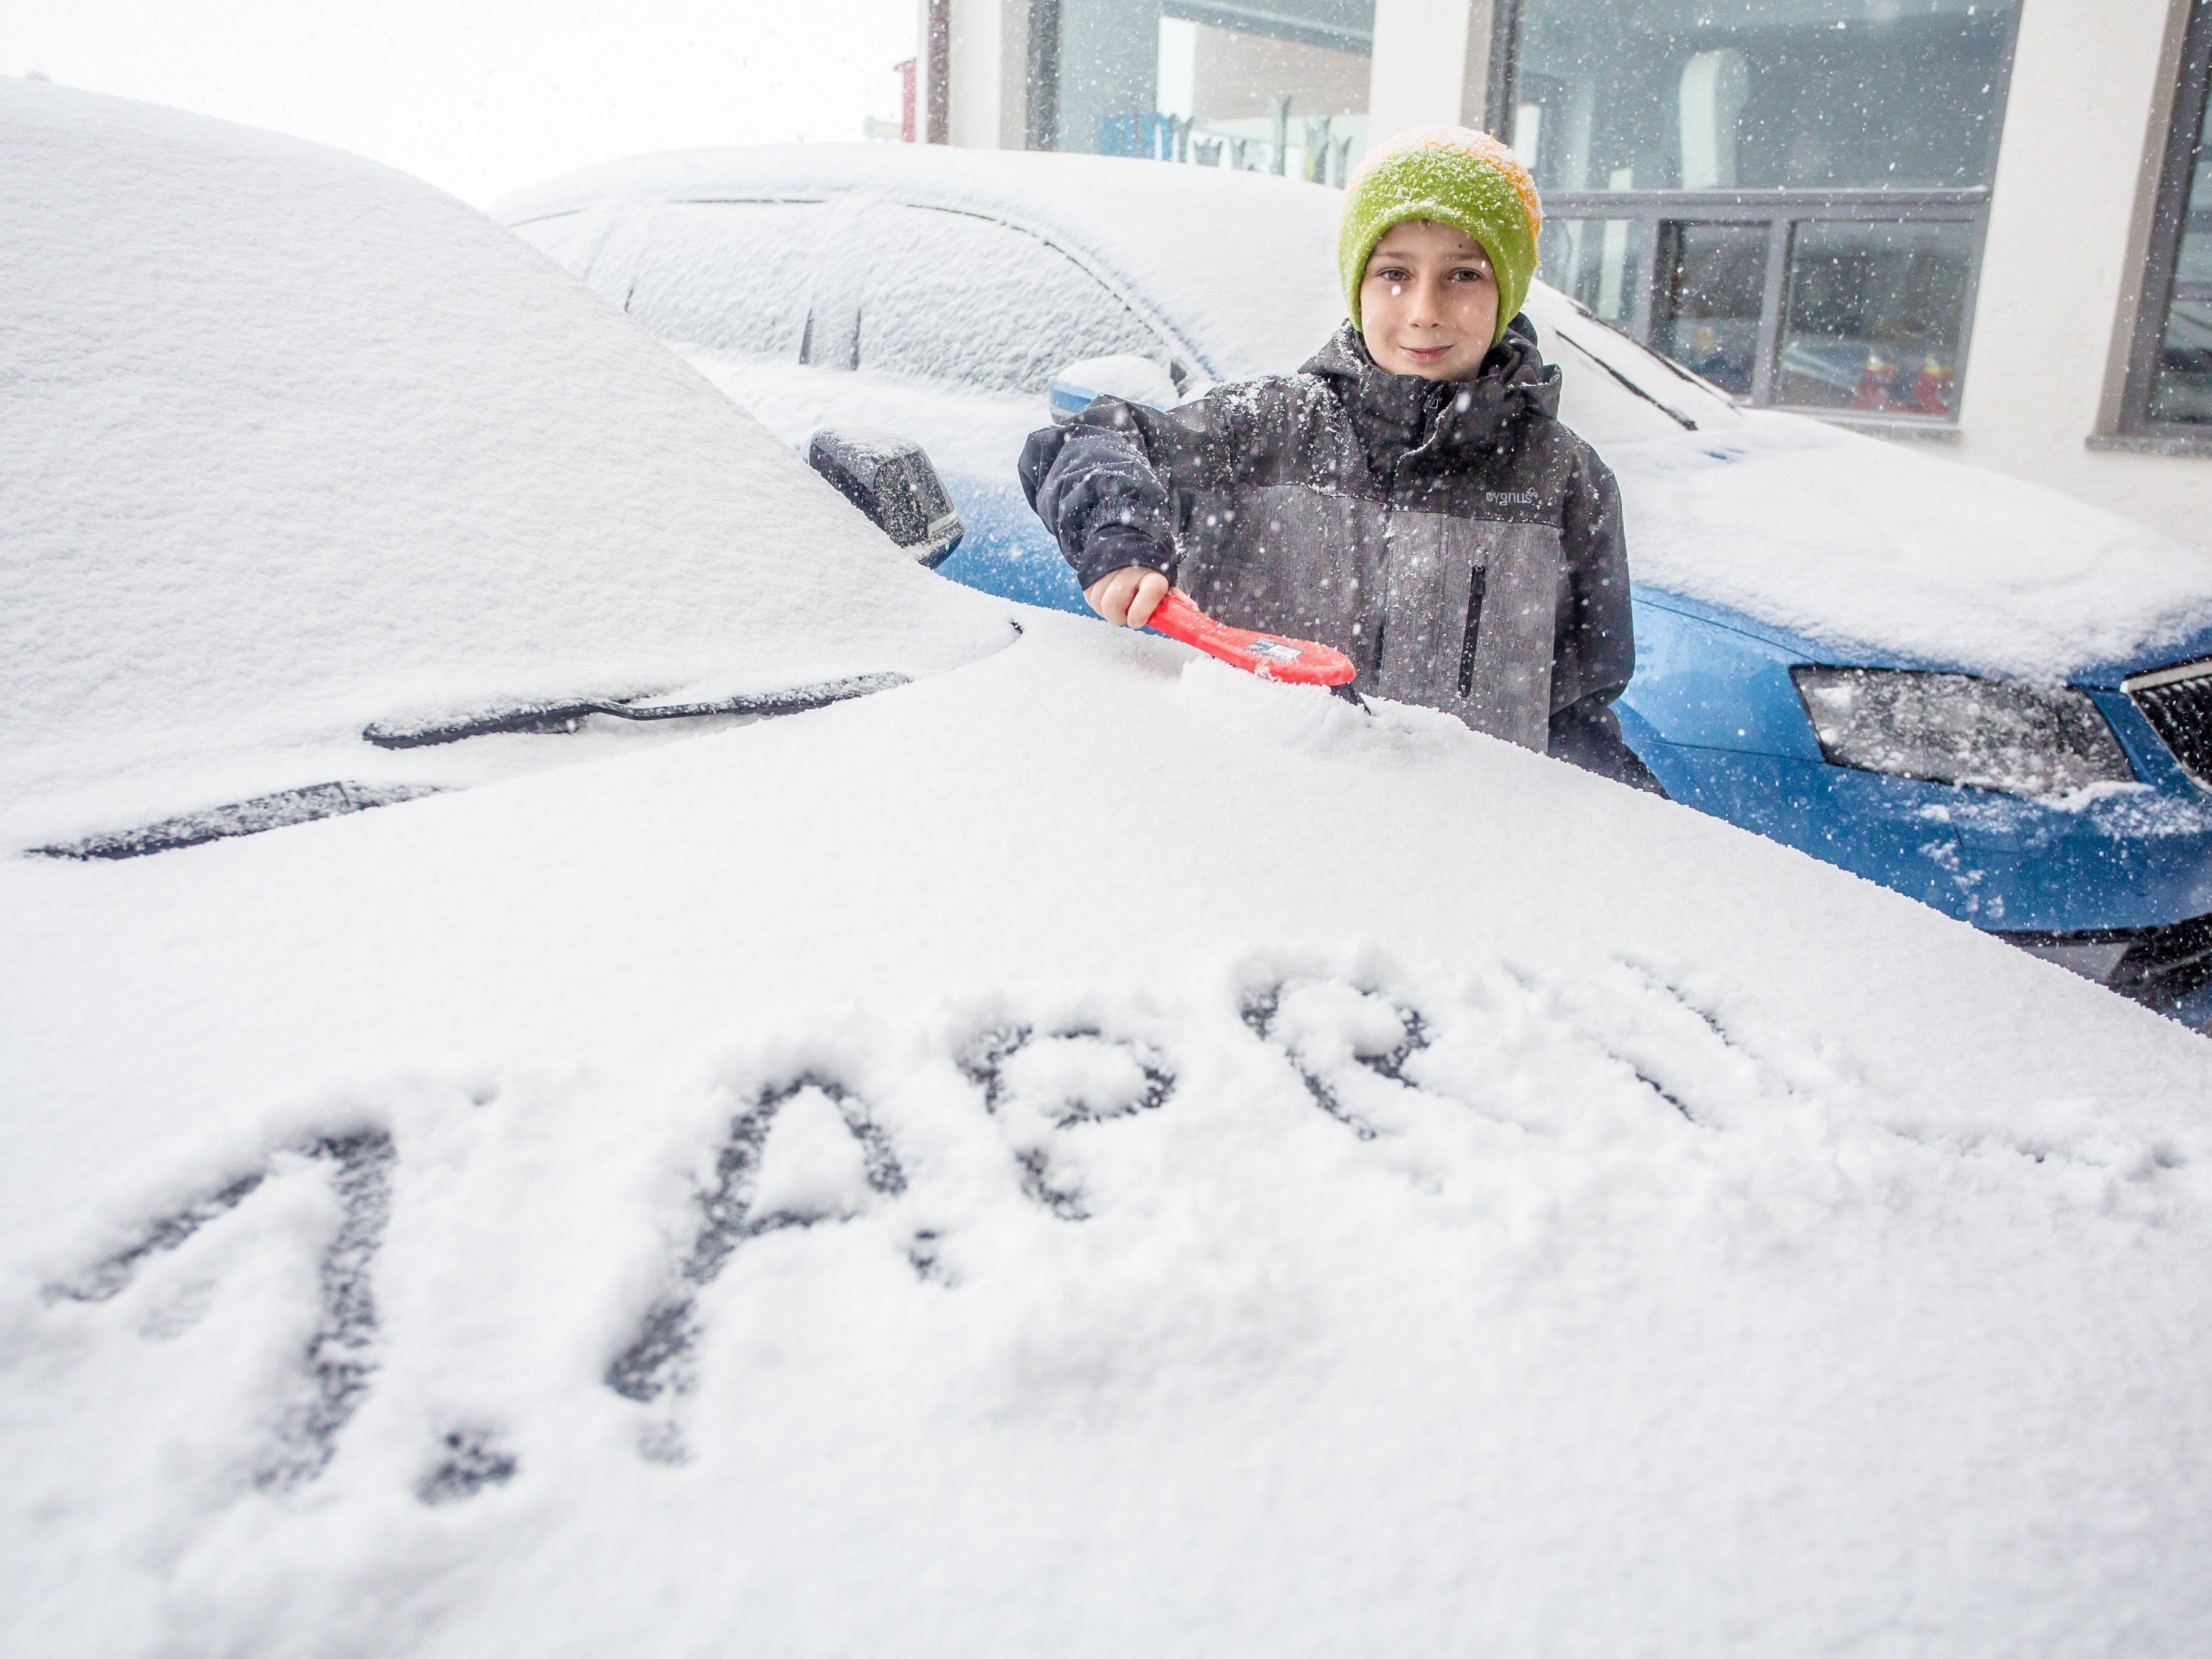 Verkehrsbehinderungen am 1. April - Schnee auch am Osterwochenende.